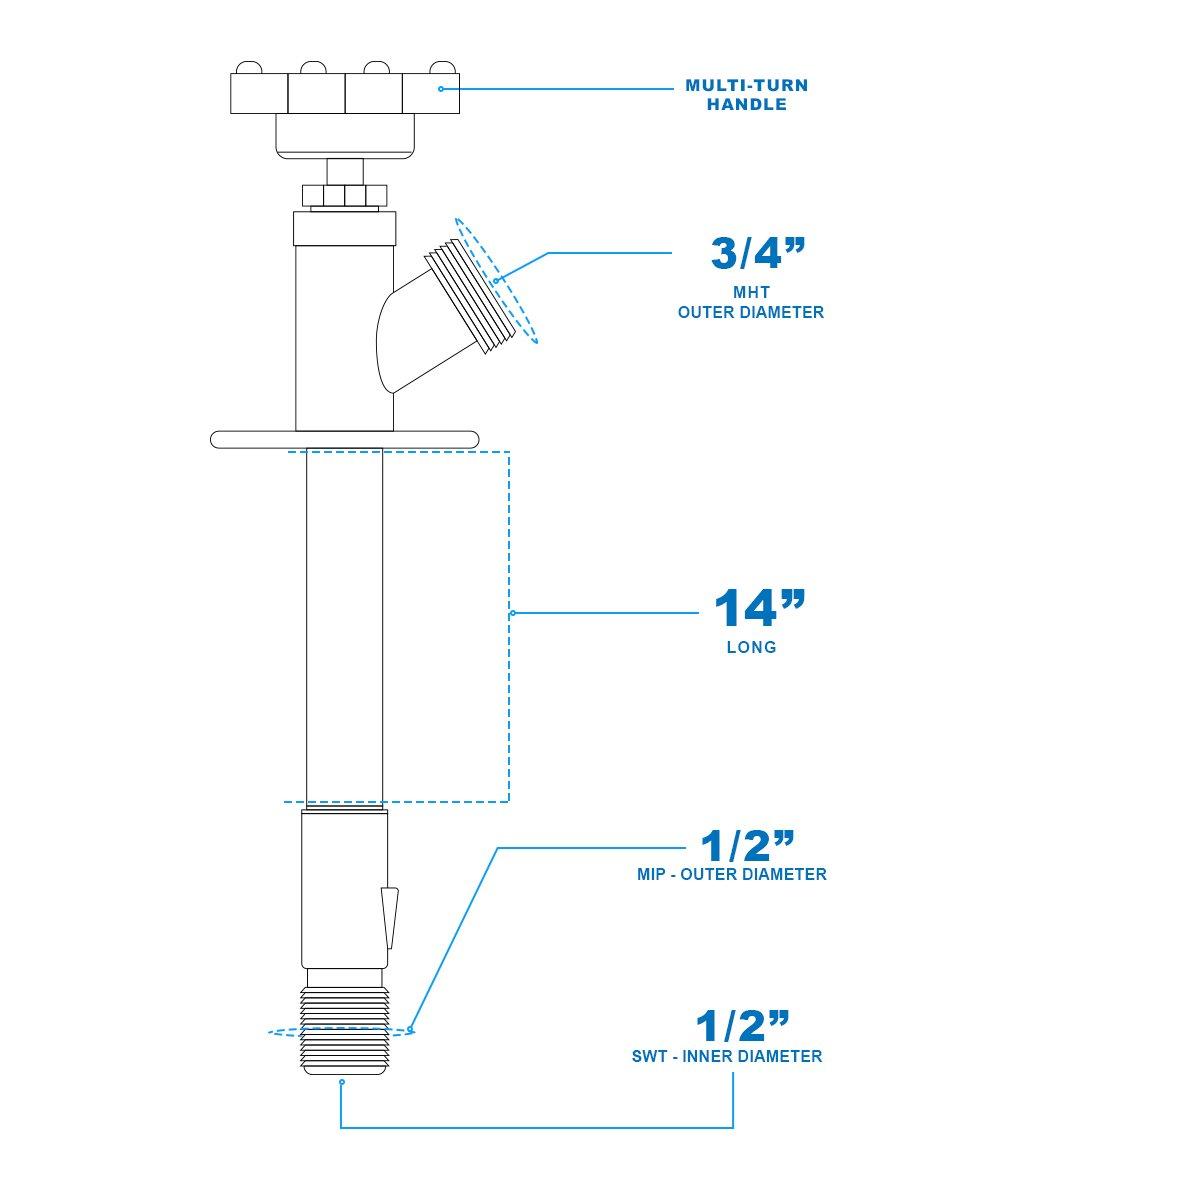 Everflow Supplies 6208 Nl Lead Free 1 2 Inch Mip Sweat Inlet X 8 Ze 208s6 Switch Wiring Diagram Ceiling Fan